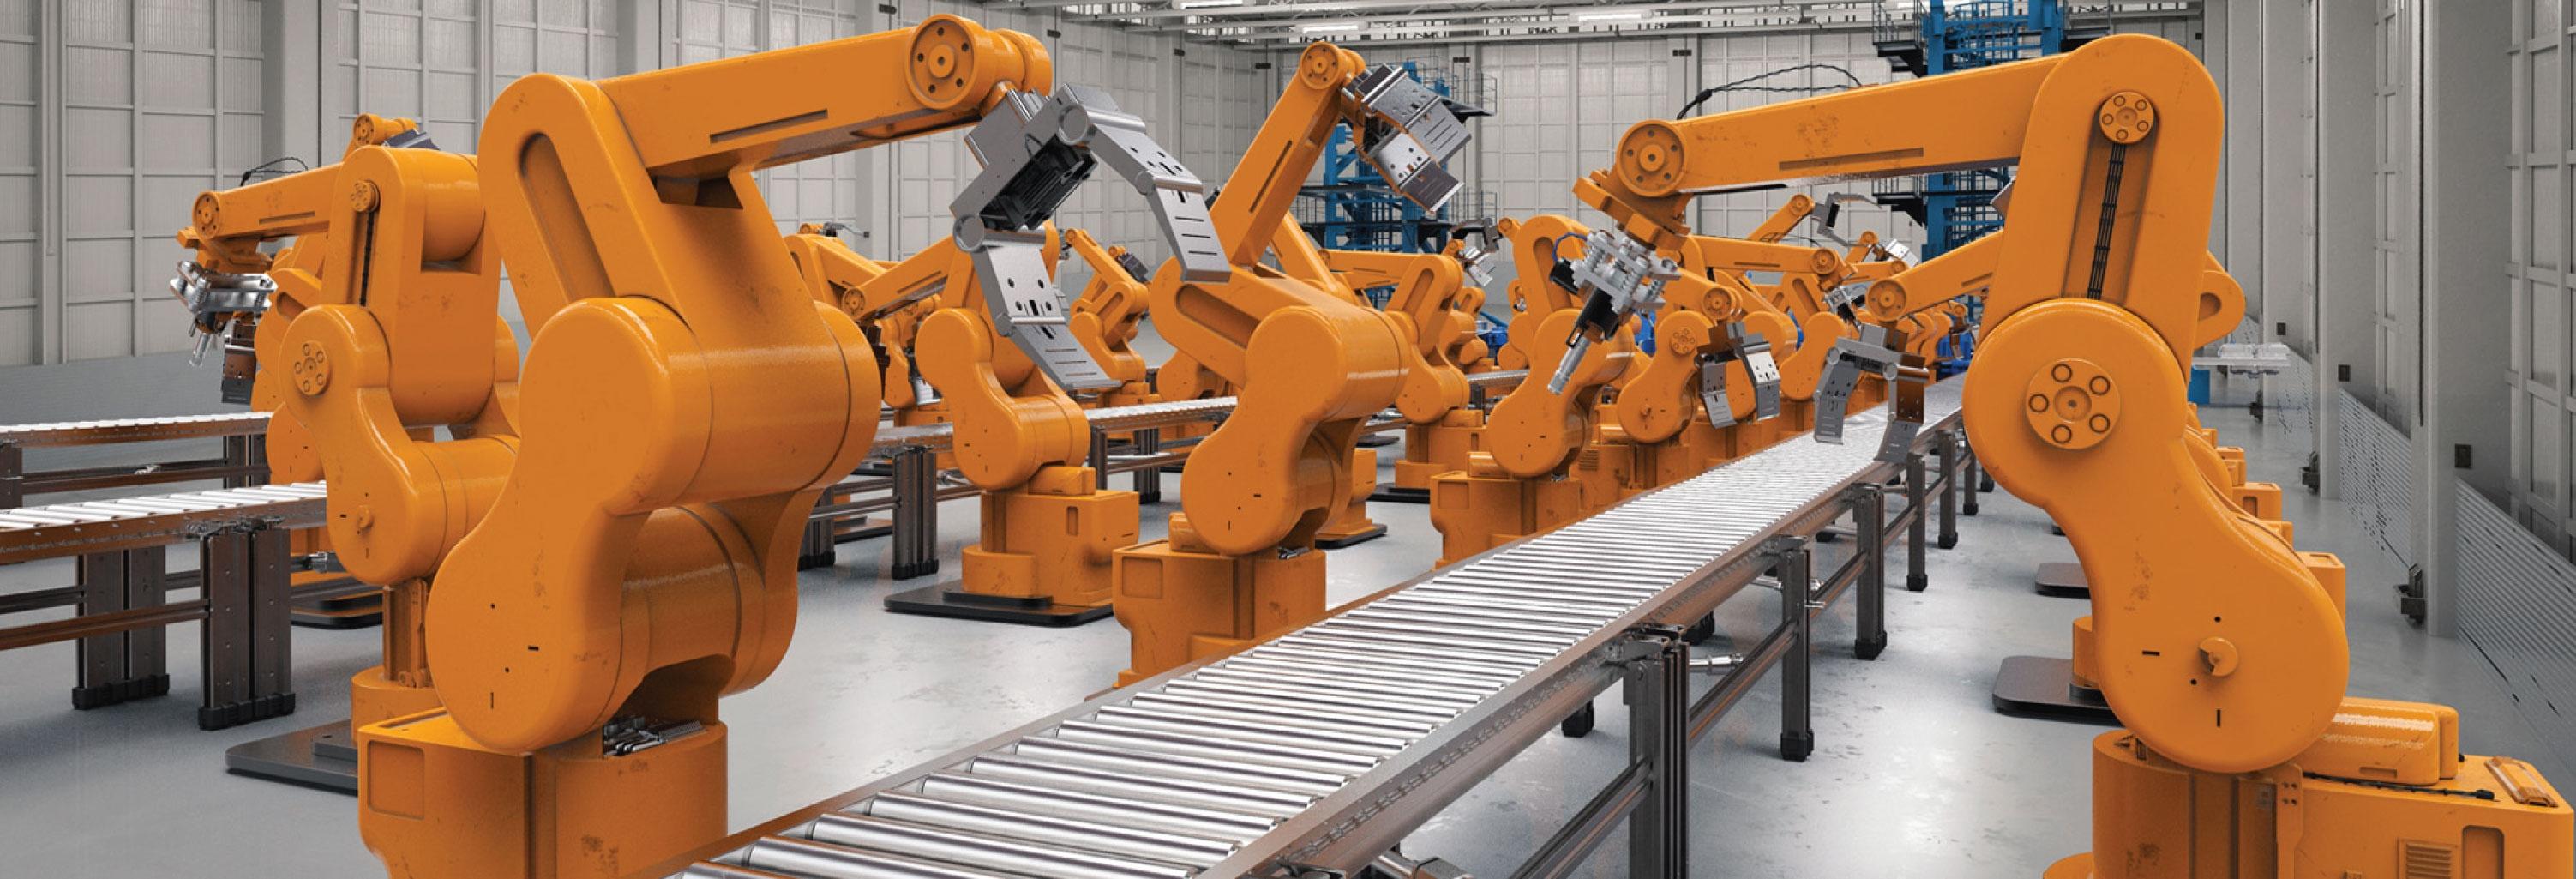 Automation & Technology